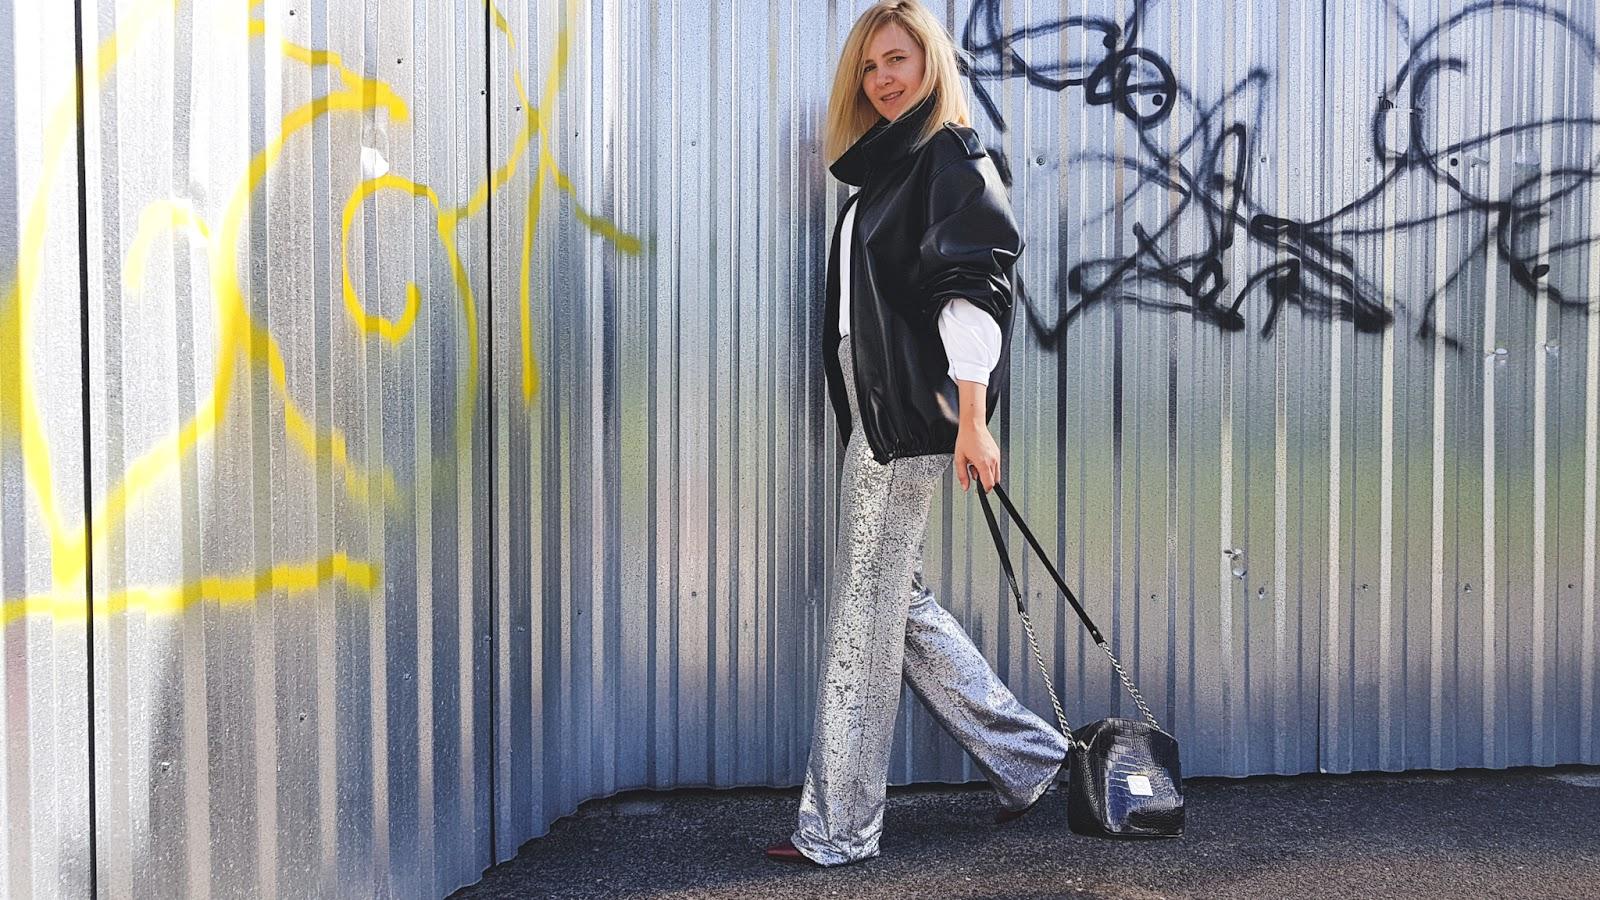 srebrne spodnie; metaliczne; silver pants; silver trend; cekinowe spodnie; sequins; sequins pants